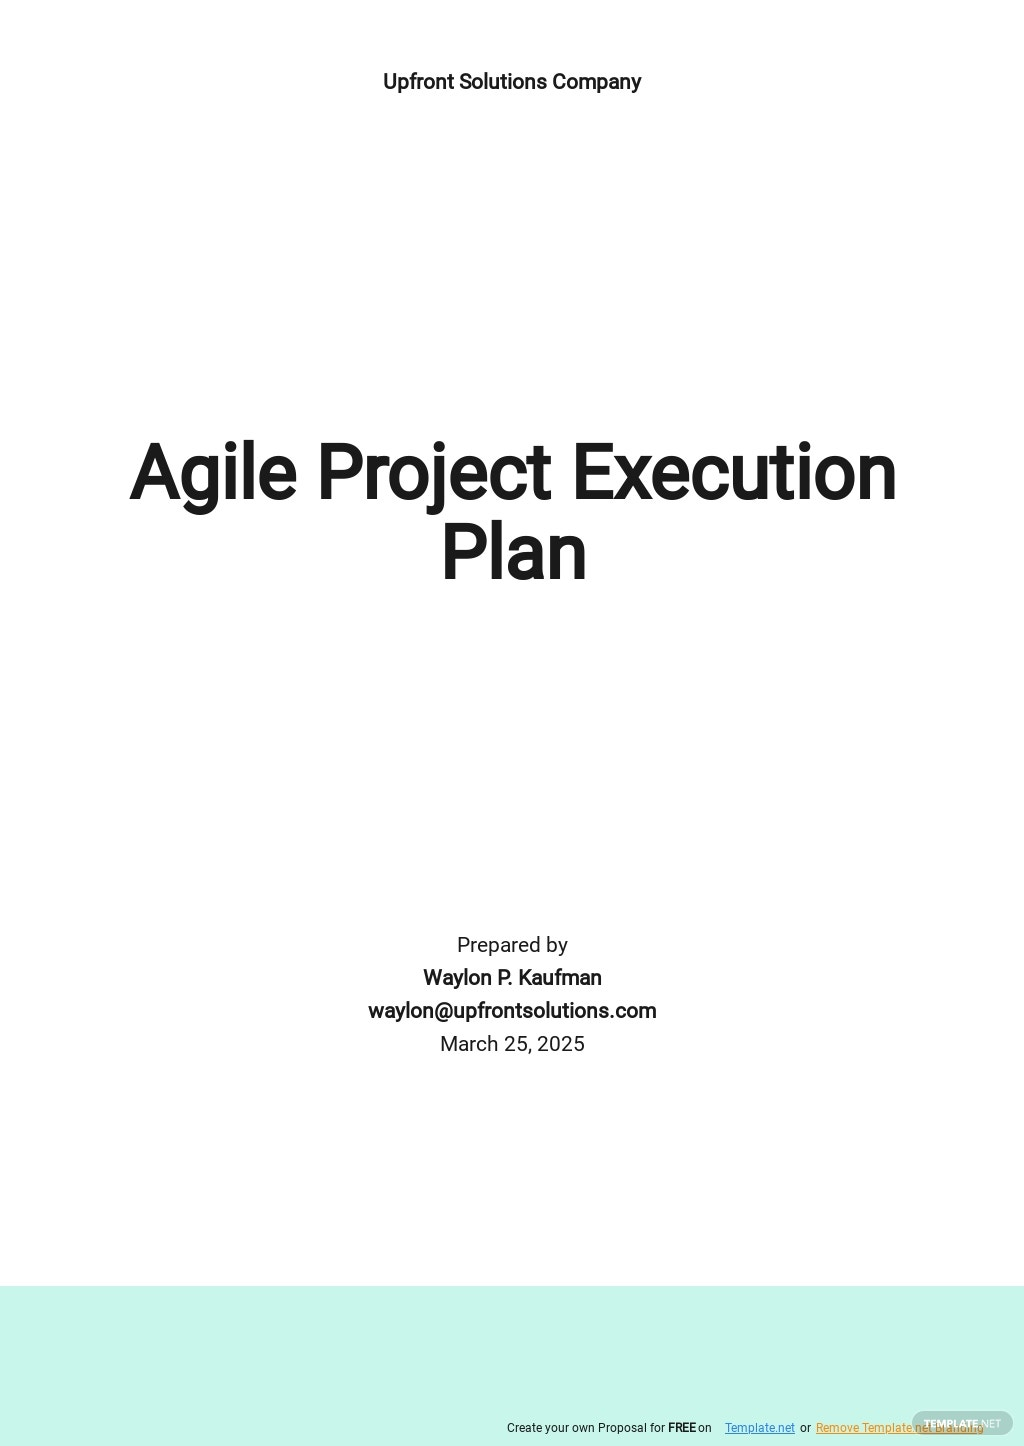 Agile Project Execution Plan Template.jpe